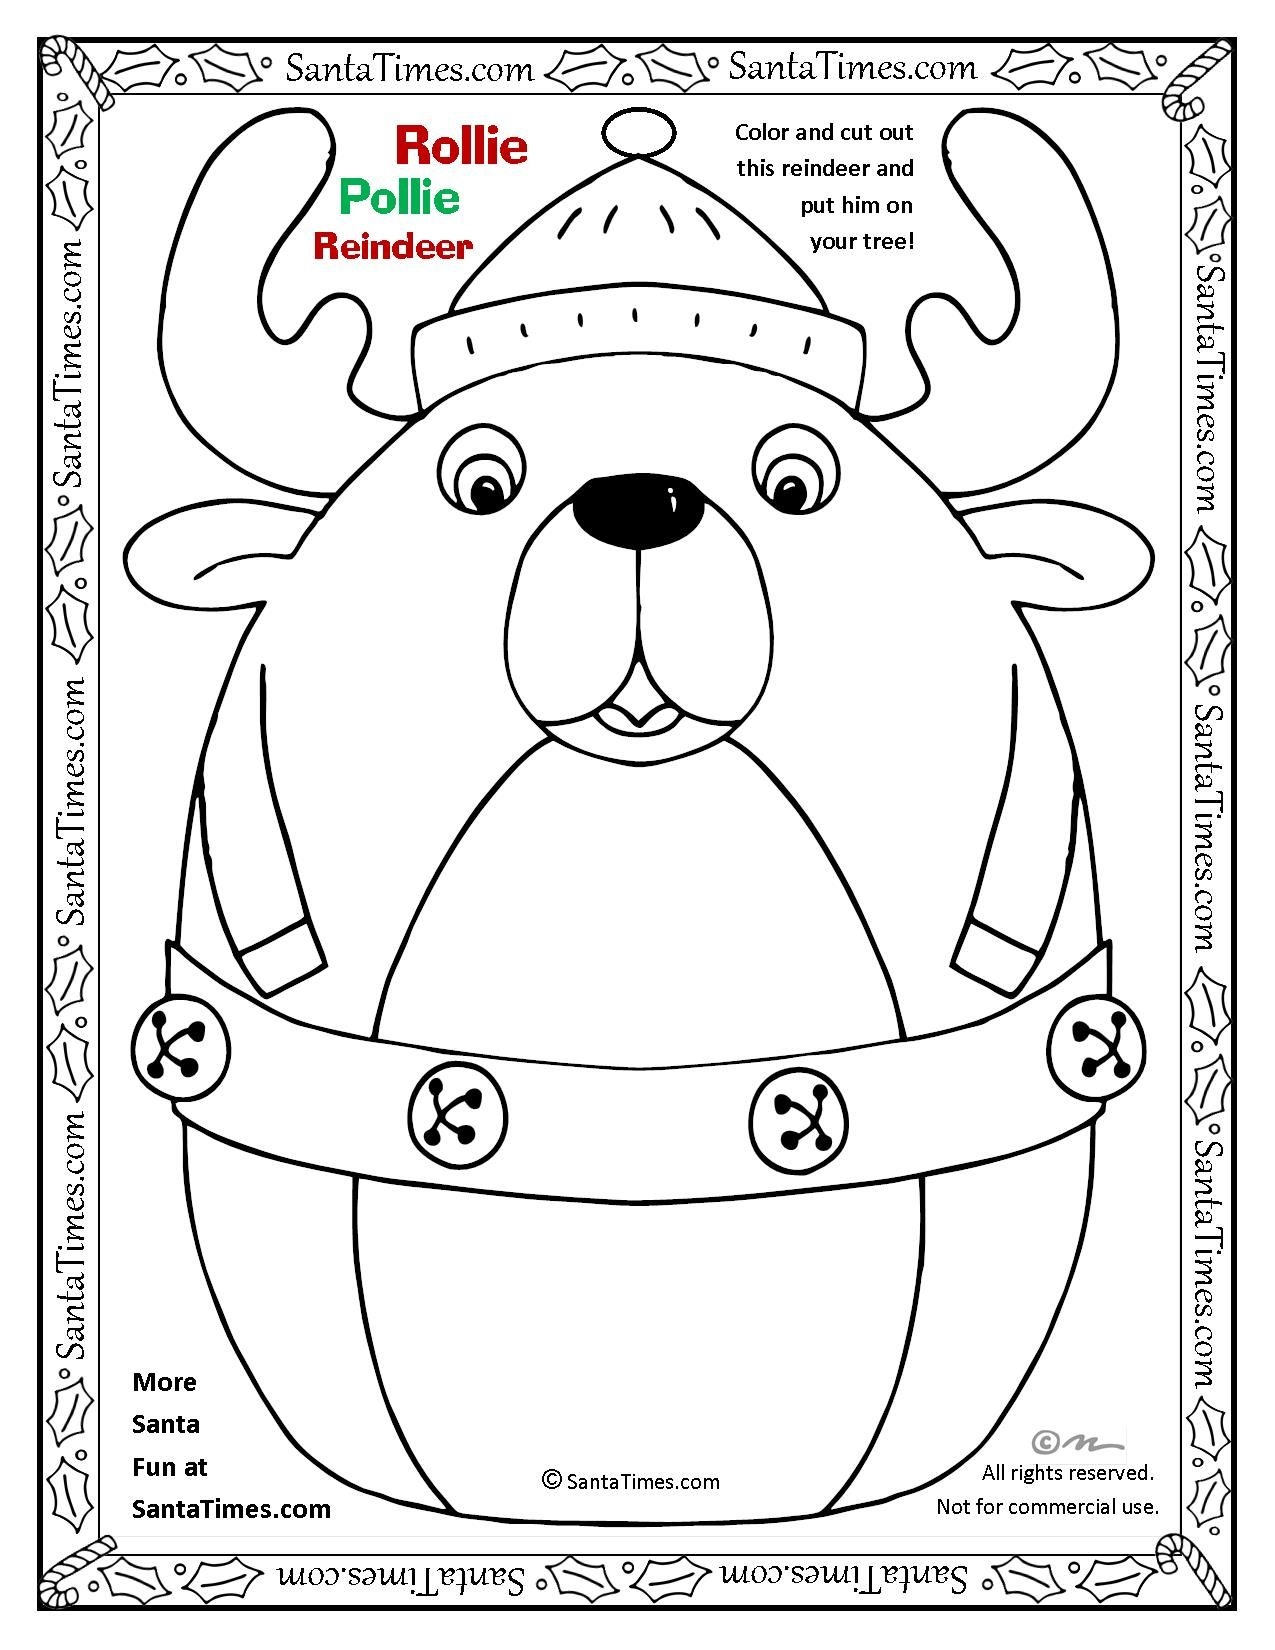 Rollie Pollie Santa Coloring Page